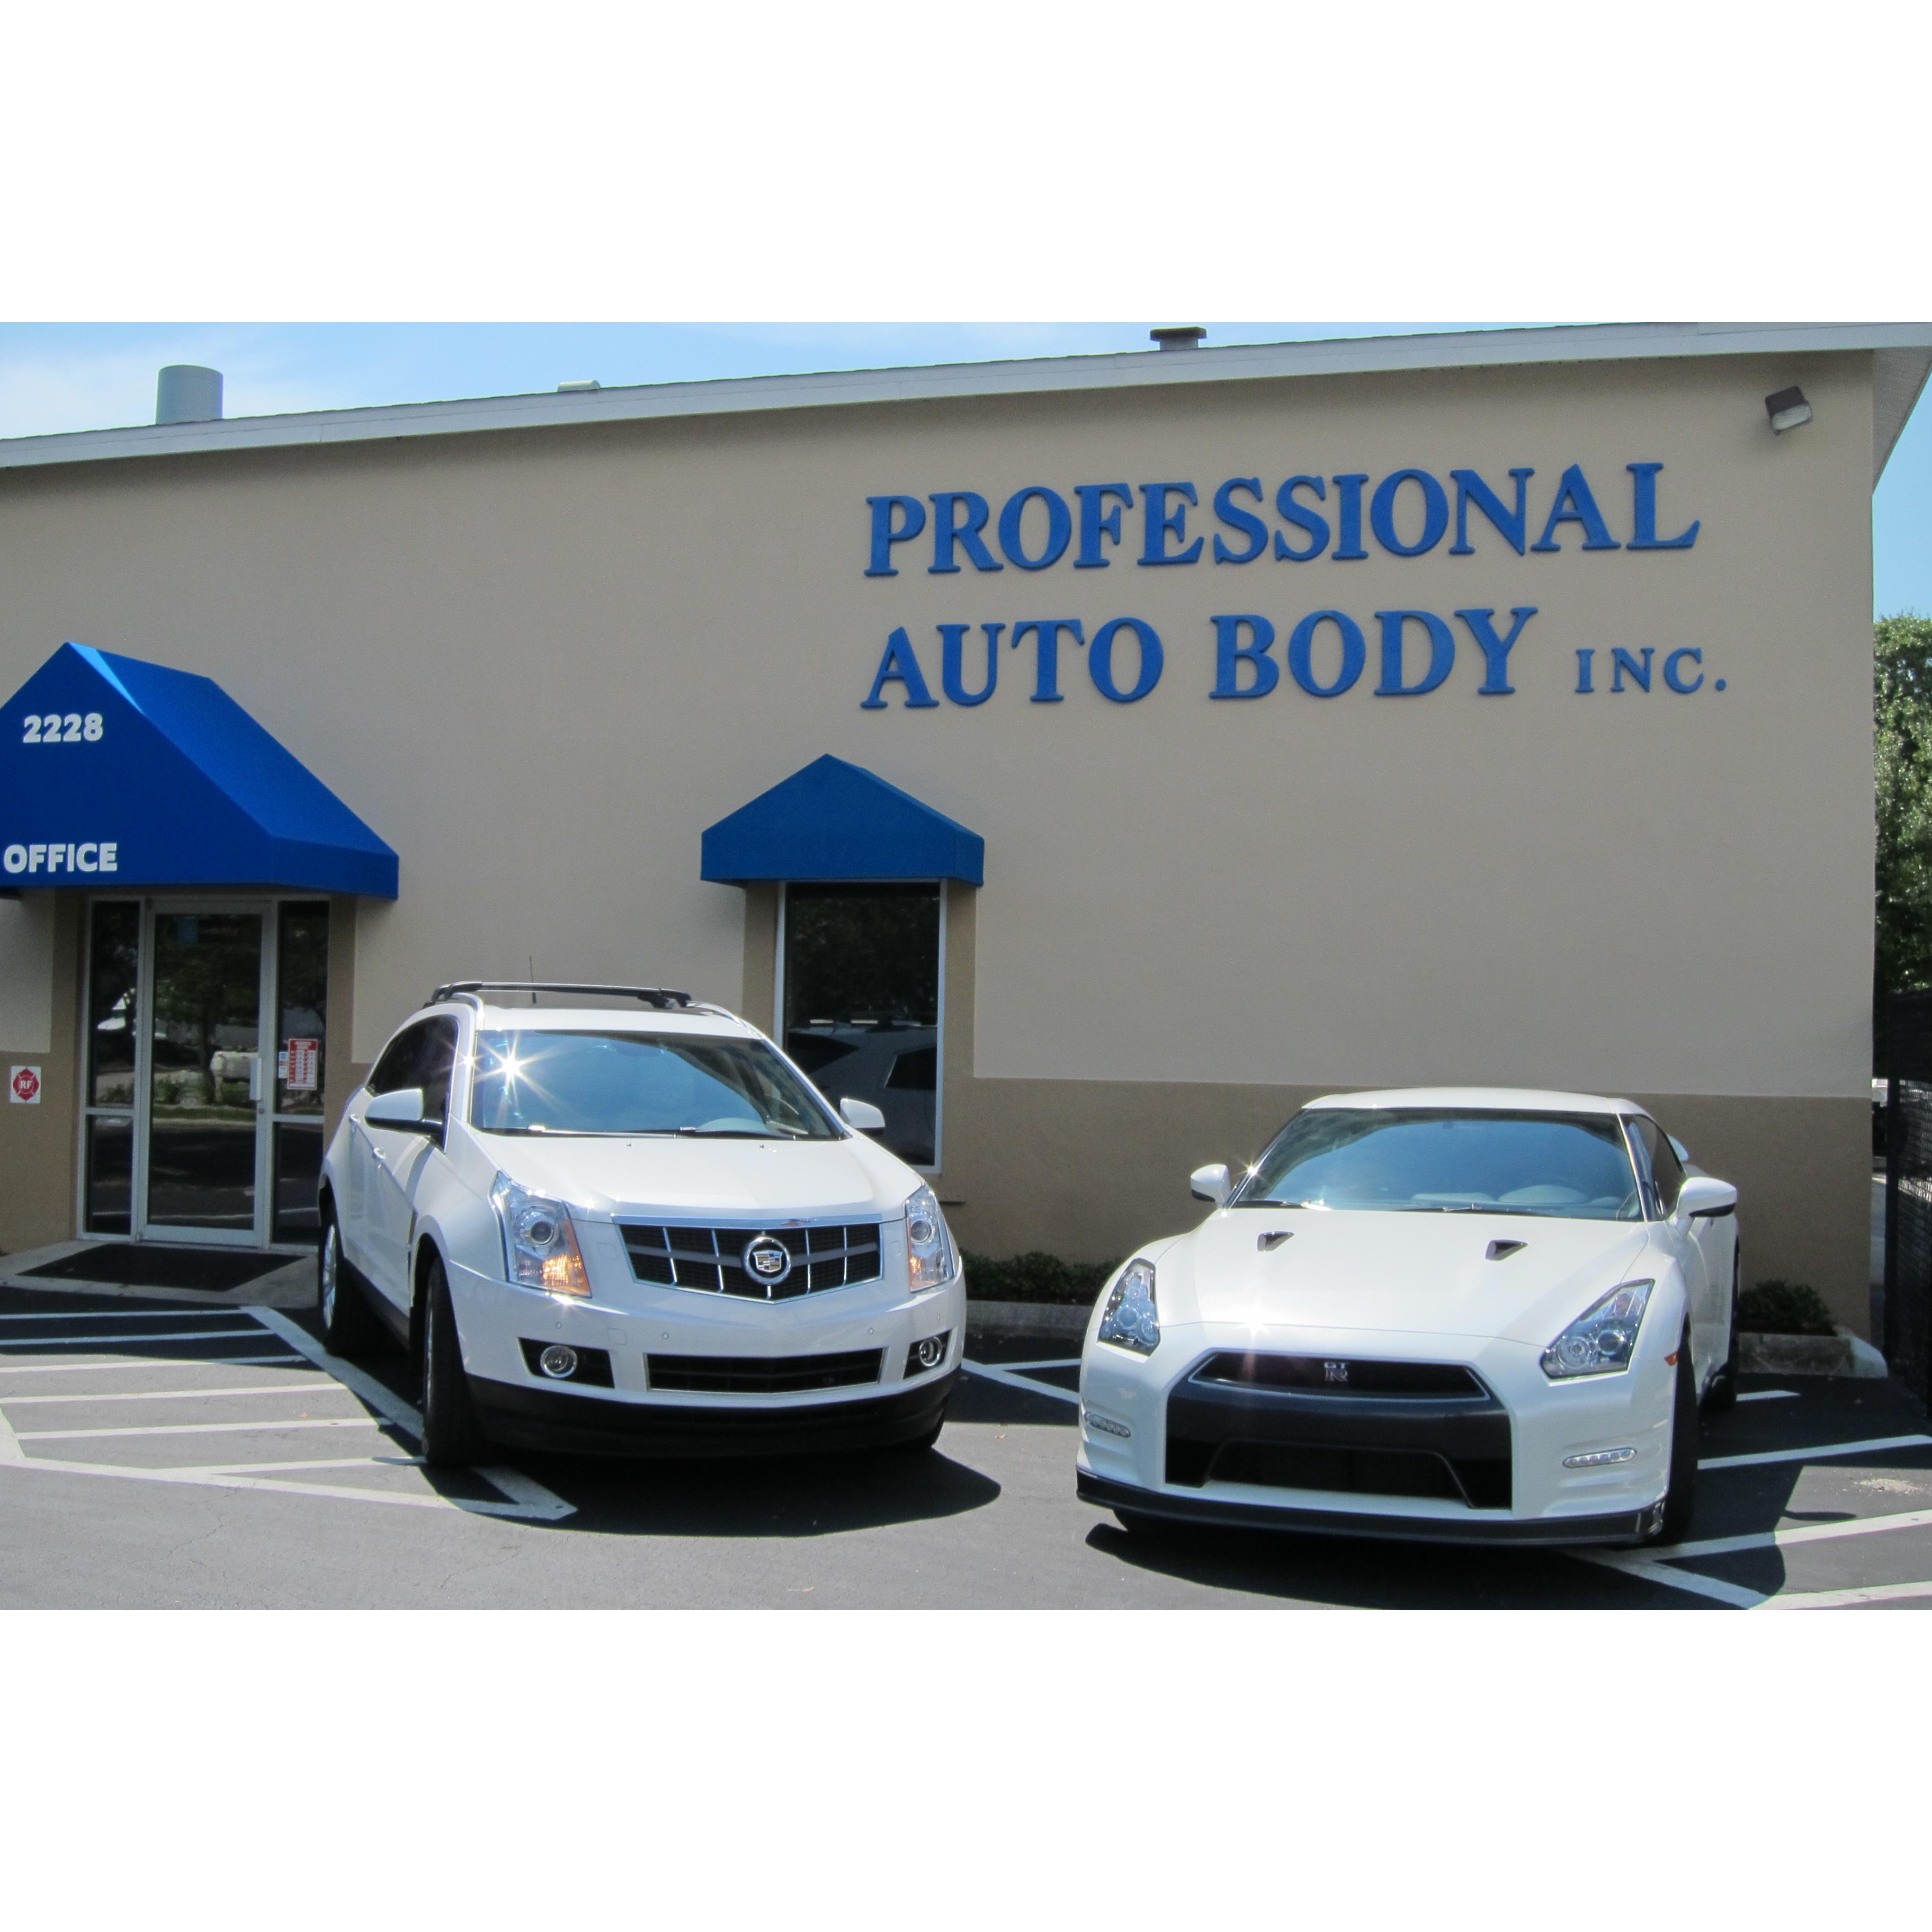 Professional Auto Body Inc.